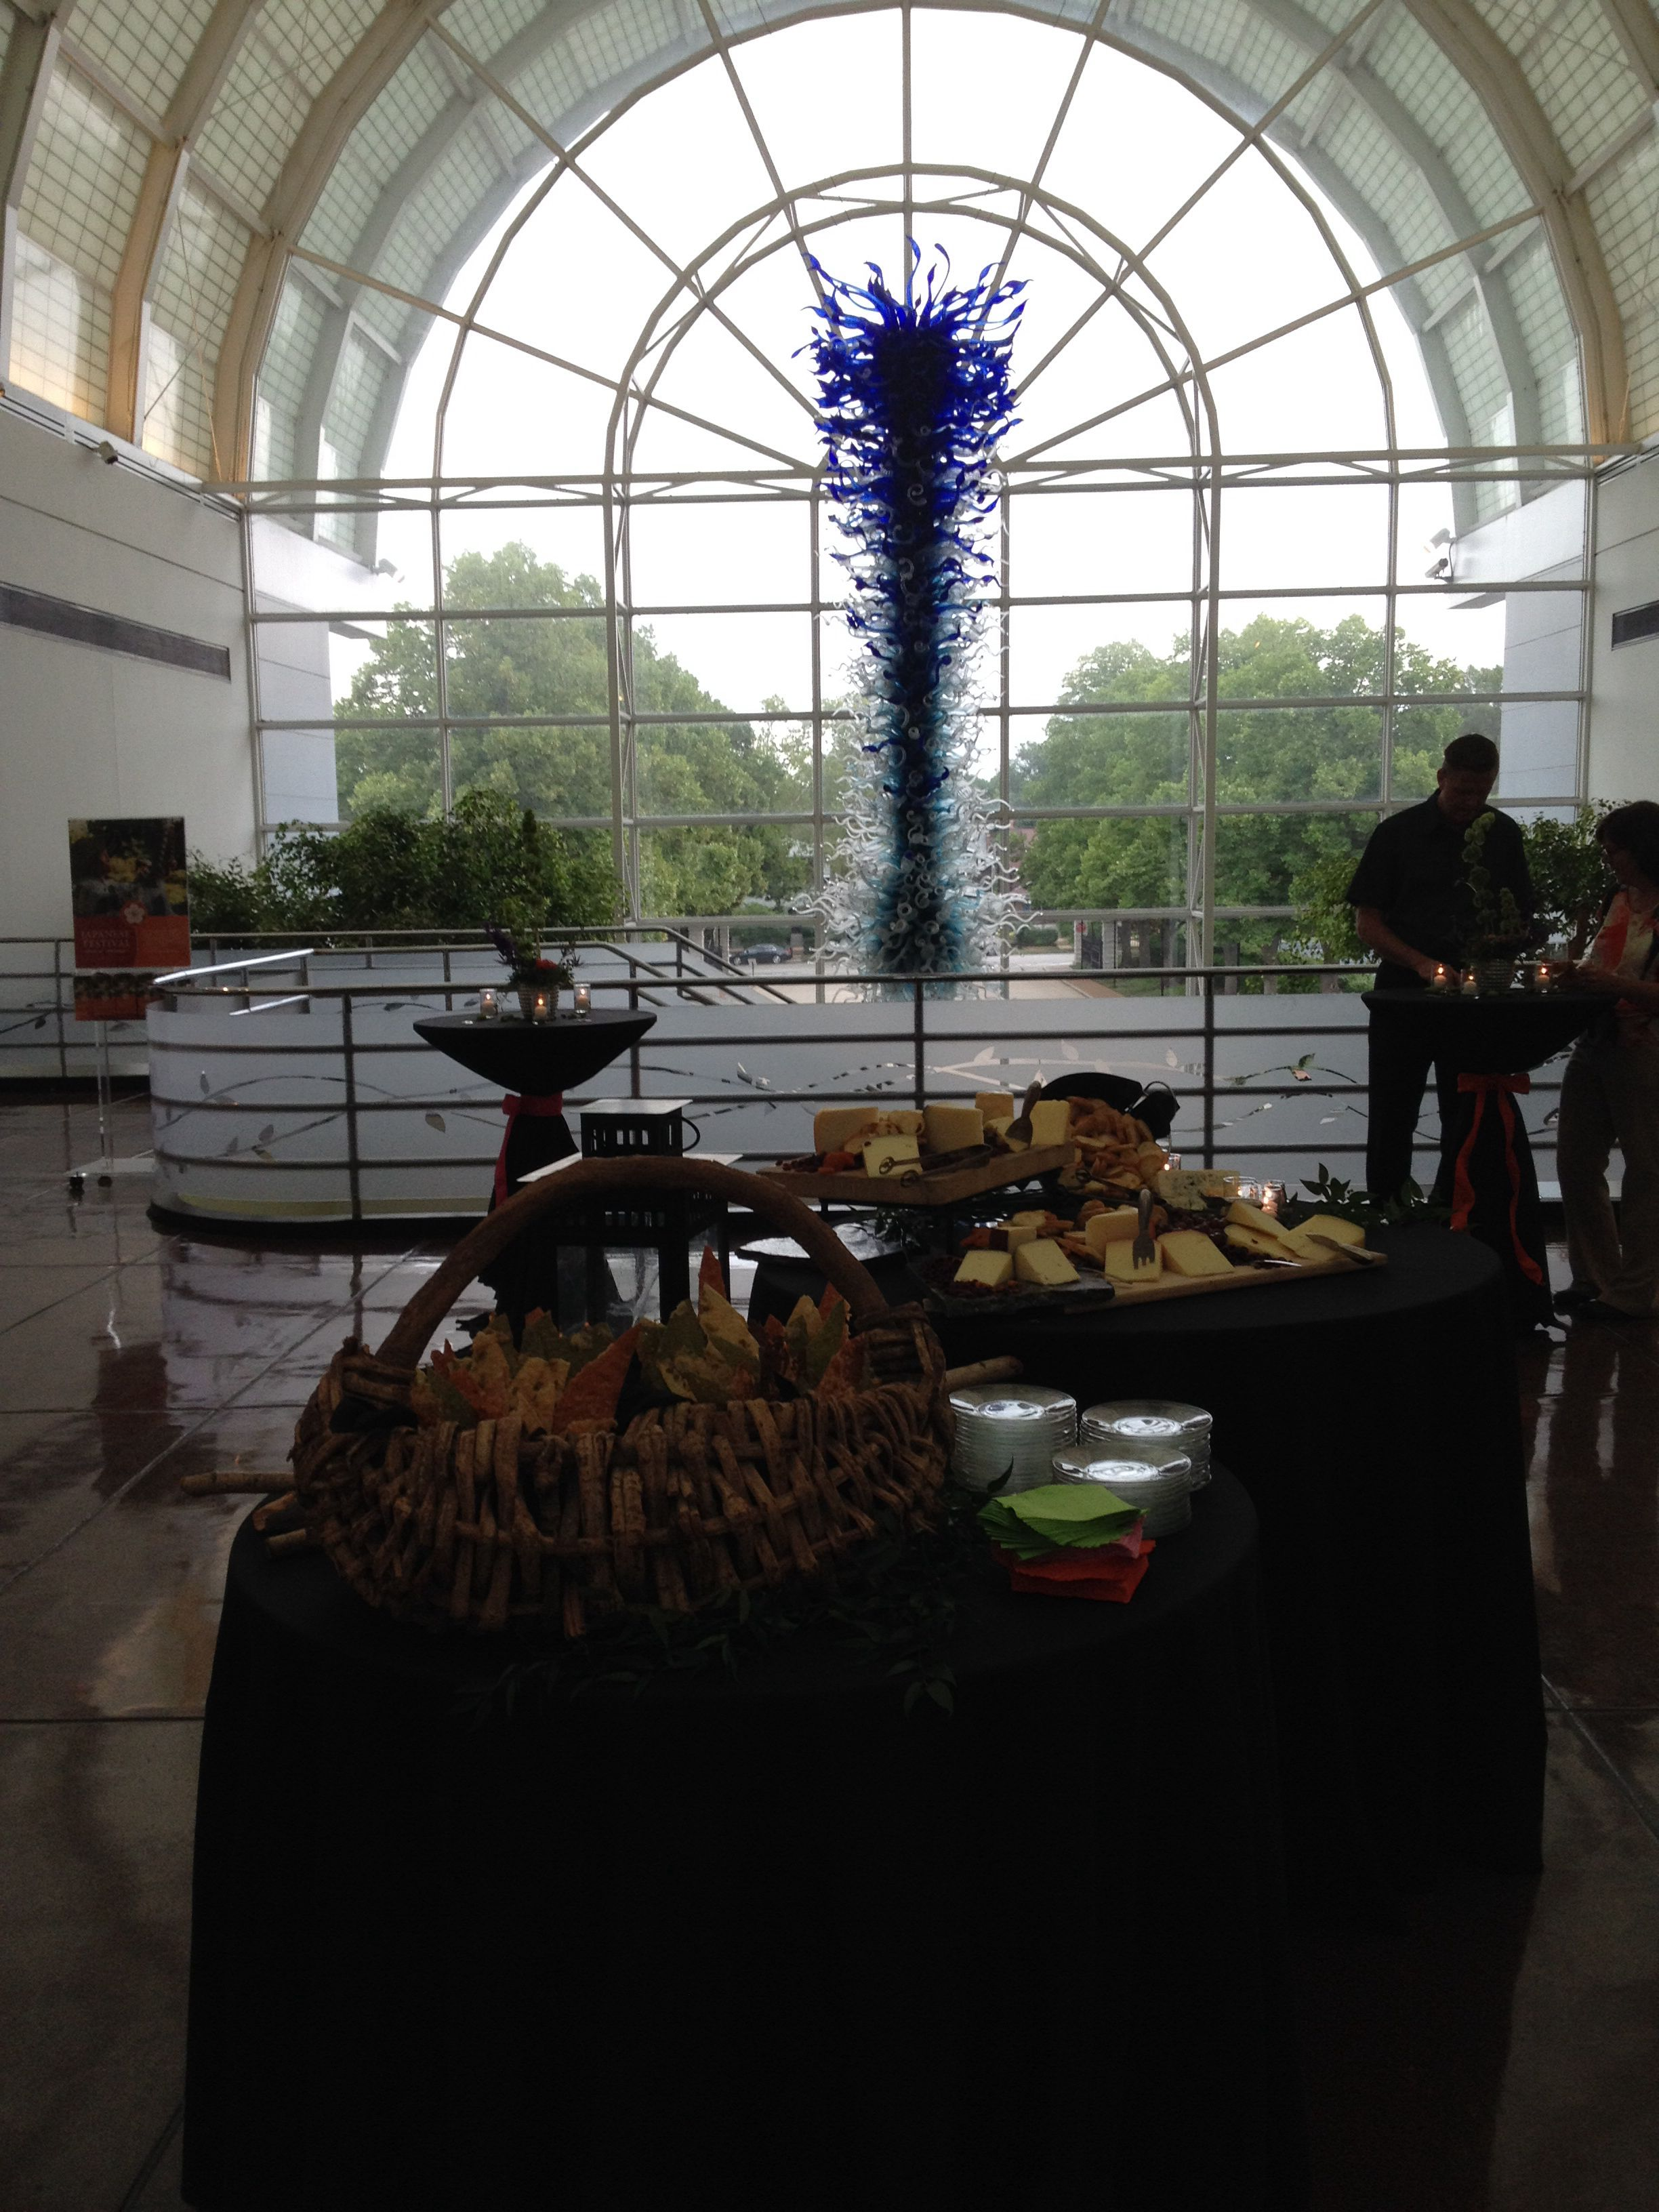 Amazing event at the Missouri Botanical Garden Cocktails